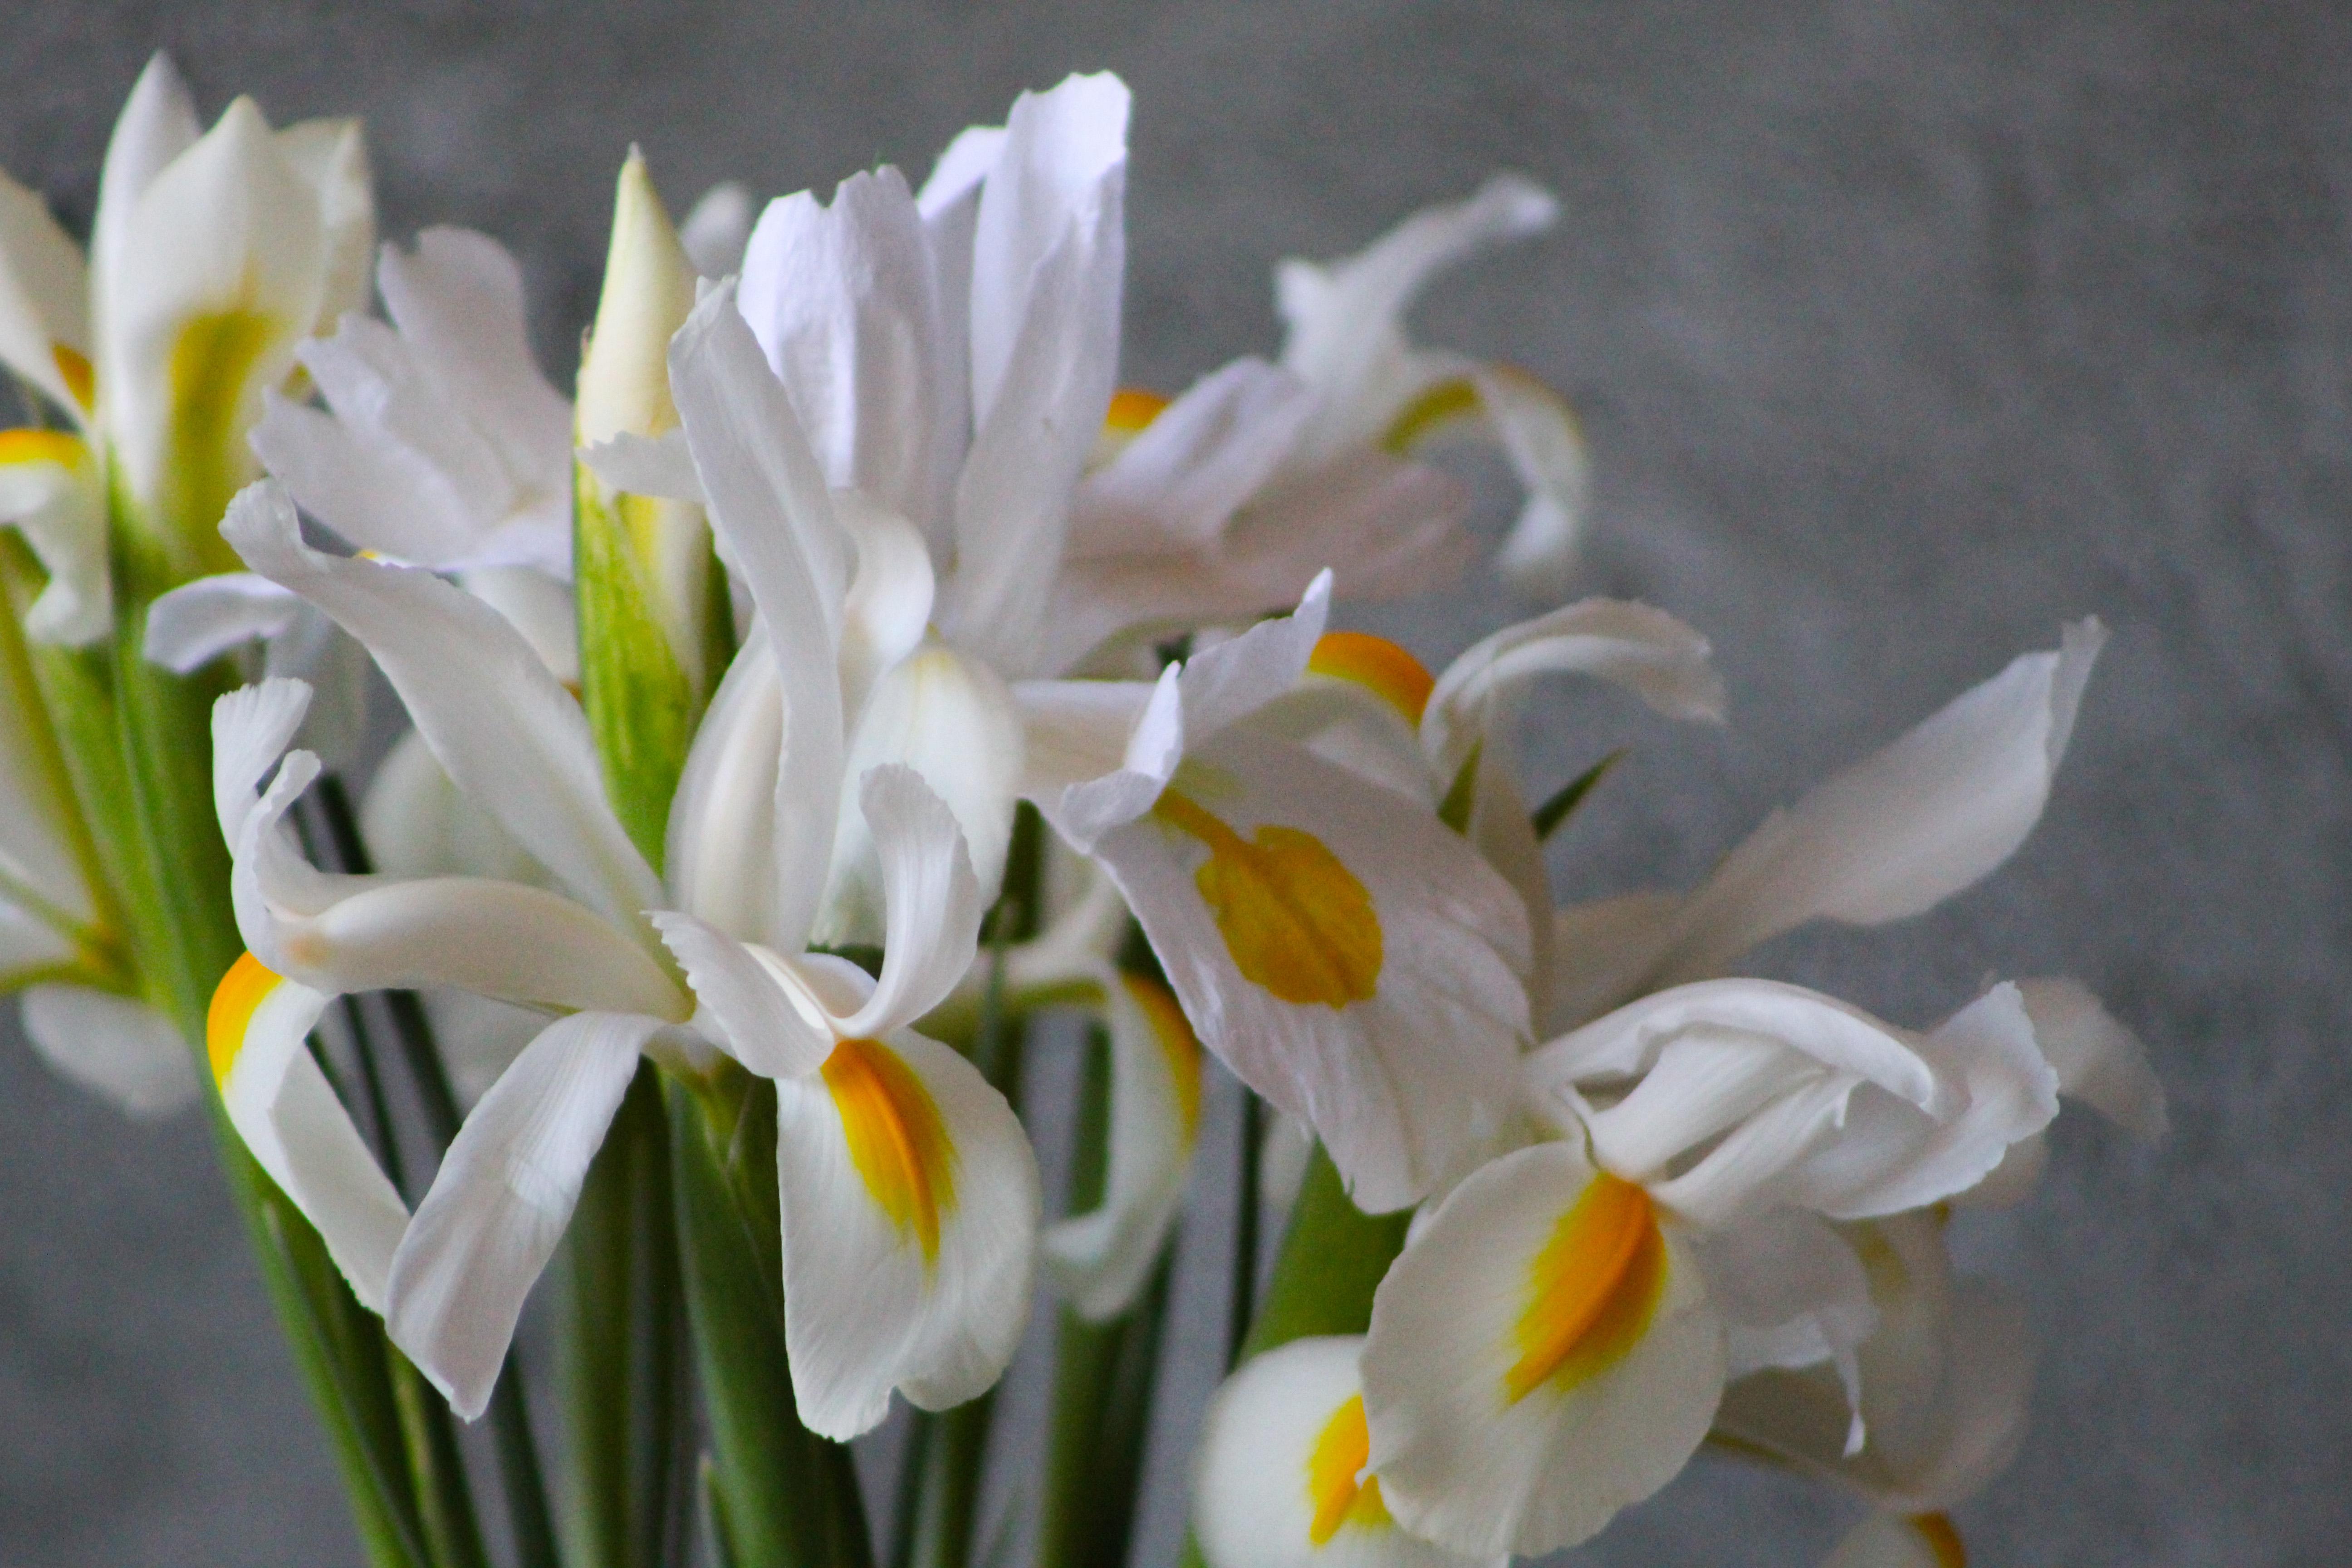 Crepe Paper Iris mixed with real Iris